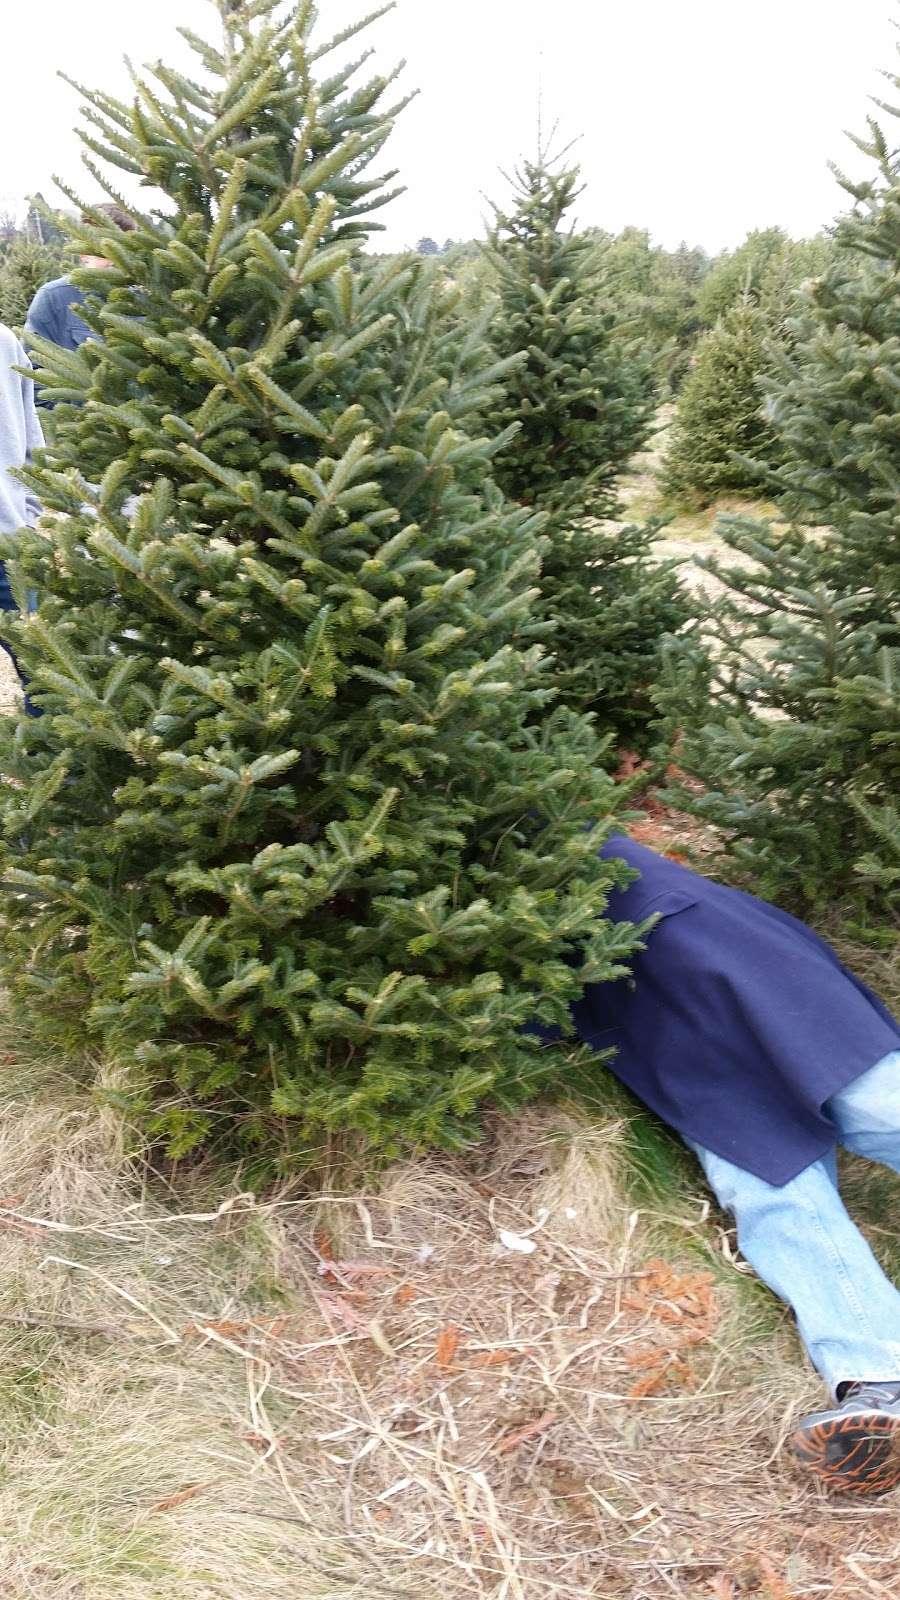 Family Tree Farm, LLC - store  | Photo 5 of 10 | Address: 4688 Dairy Rd, Red Lion, PA 17356, USA | Phone: (717) 332-6365